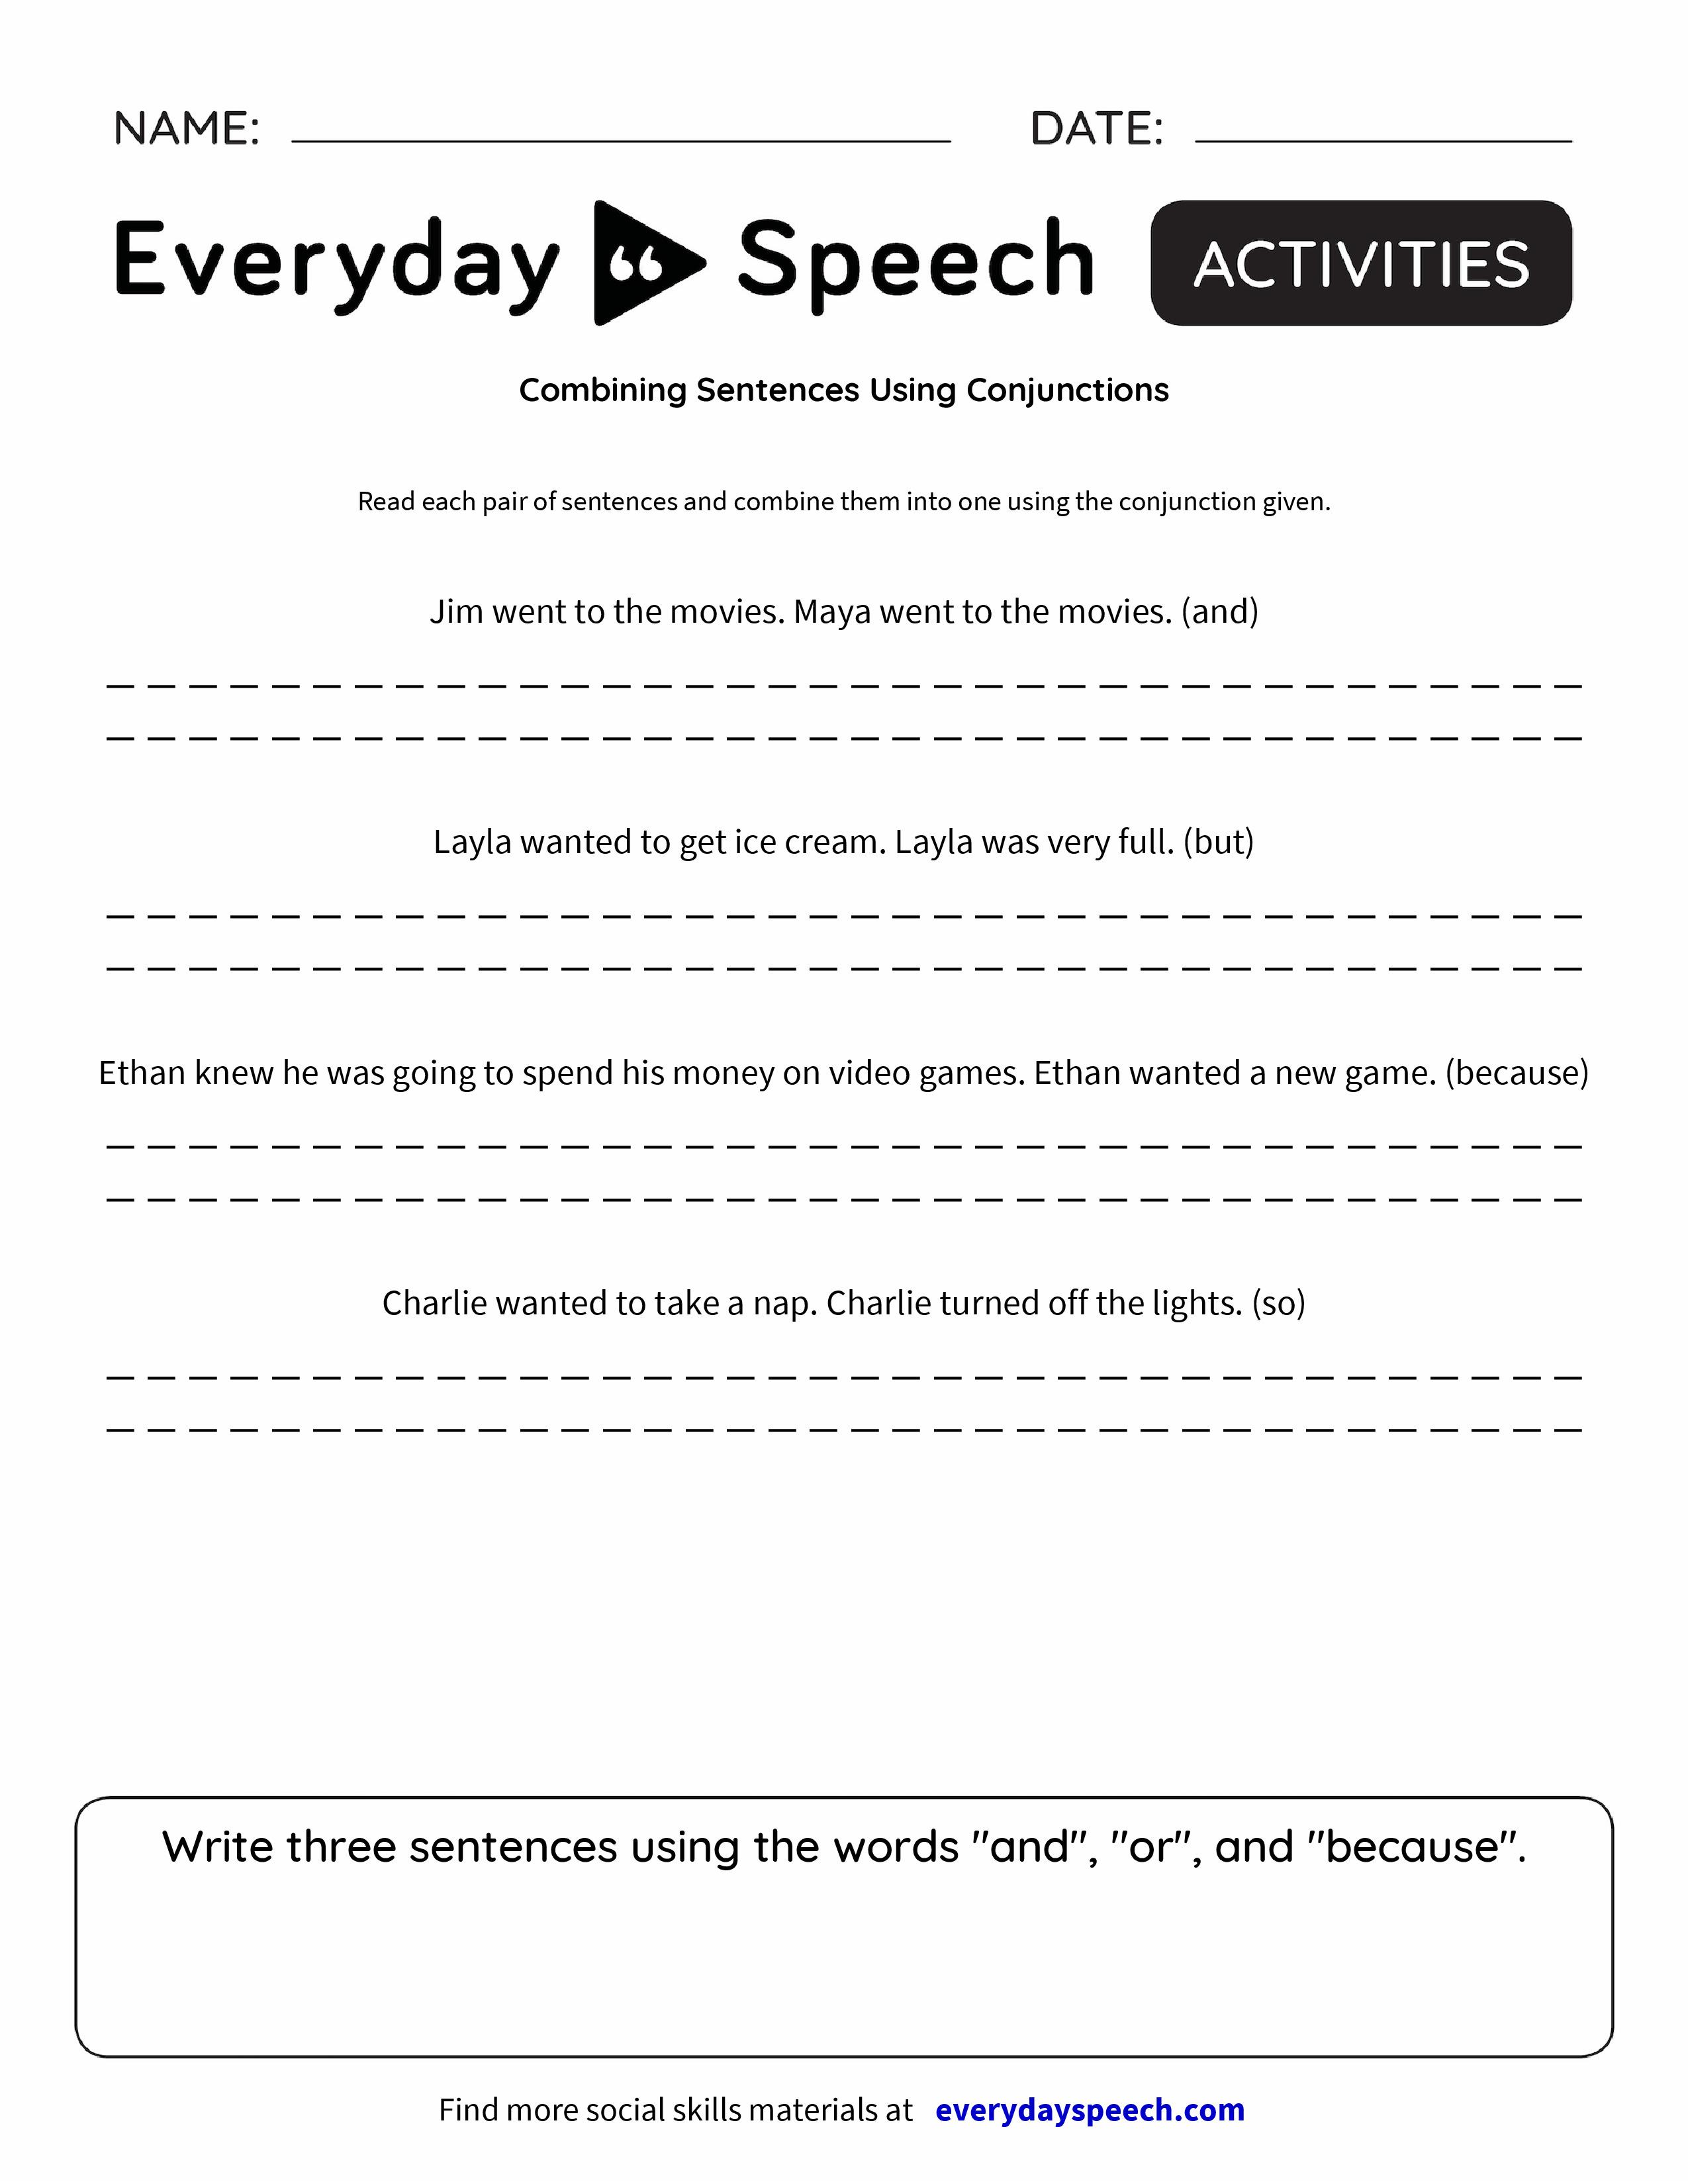 https://dubaikhalifas.com/combine-the-sentences-using-conjunctions-worksheet/ [ 400 x 3300 Pixel ]